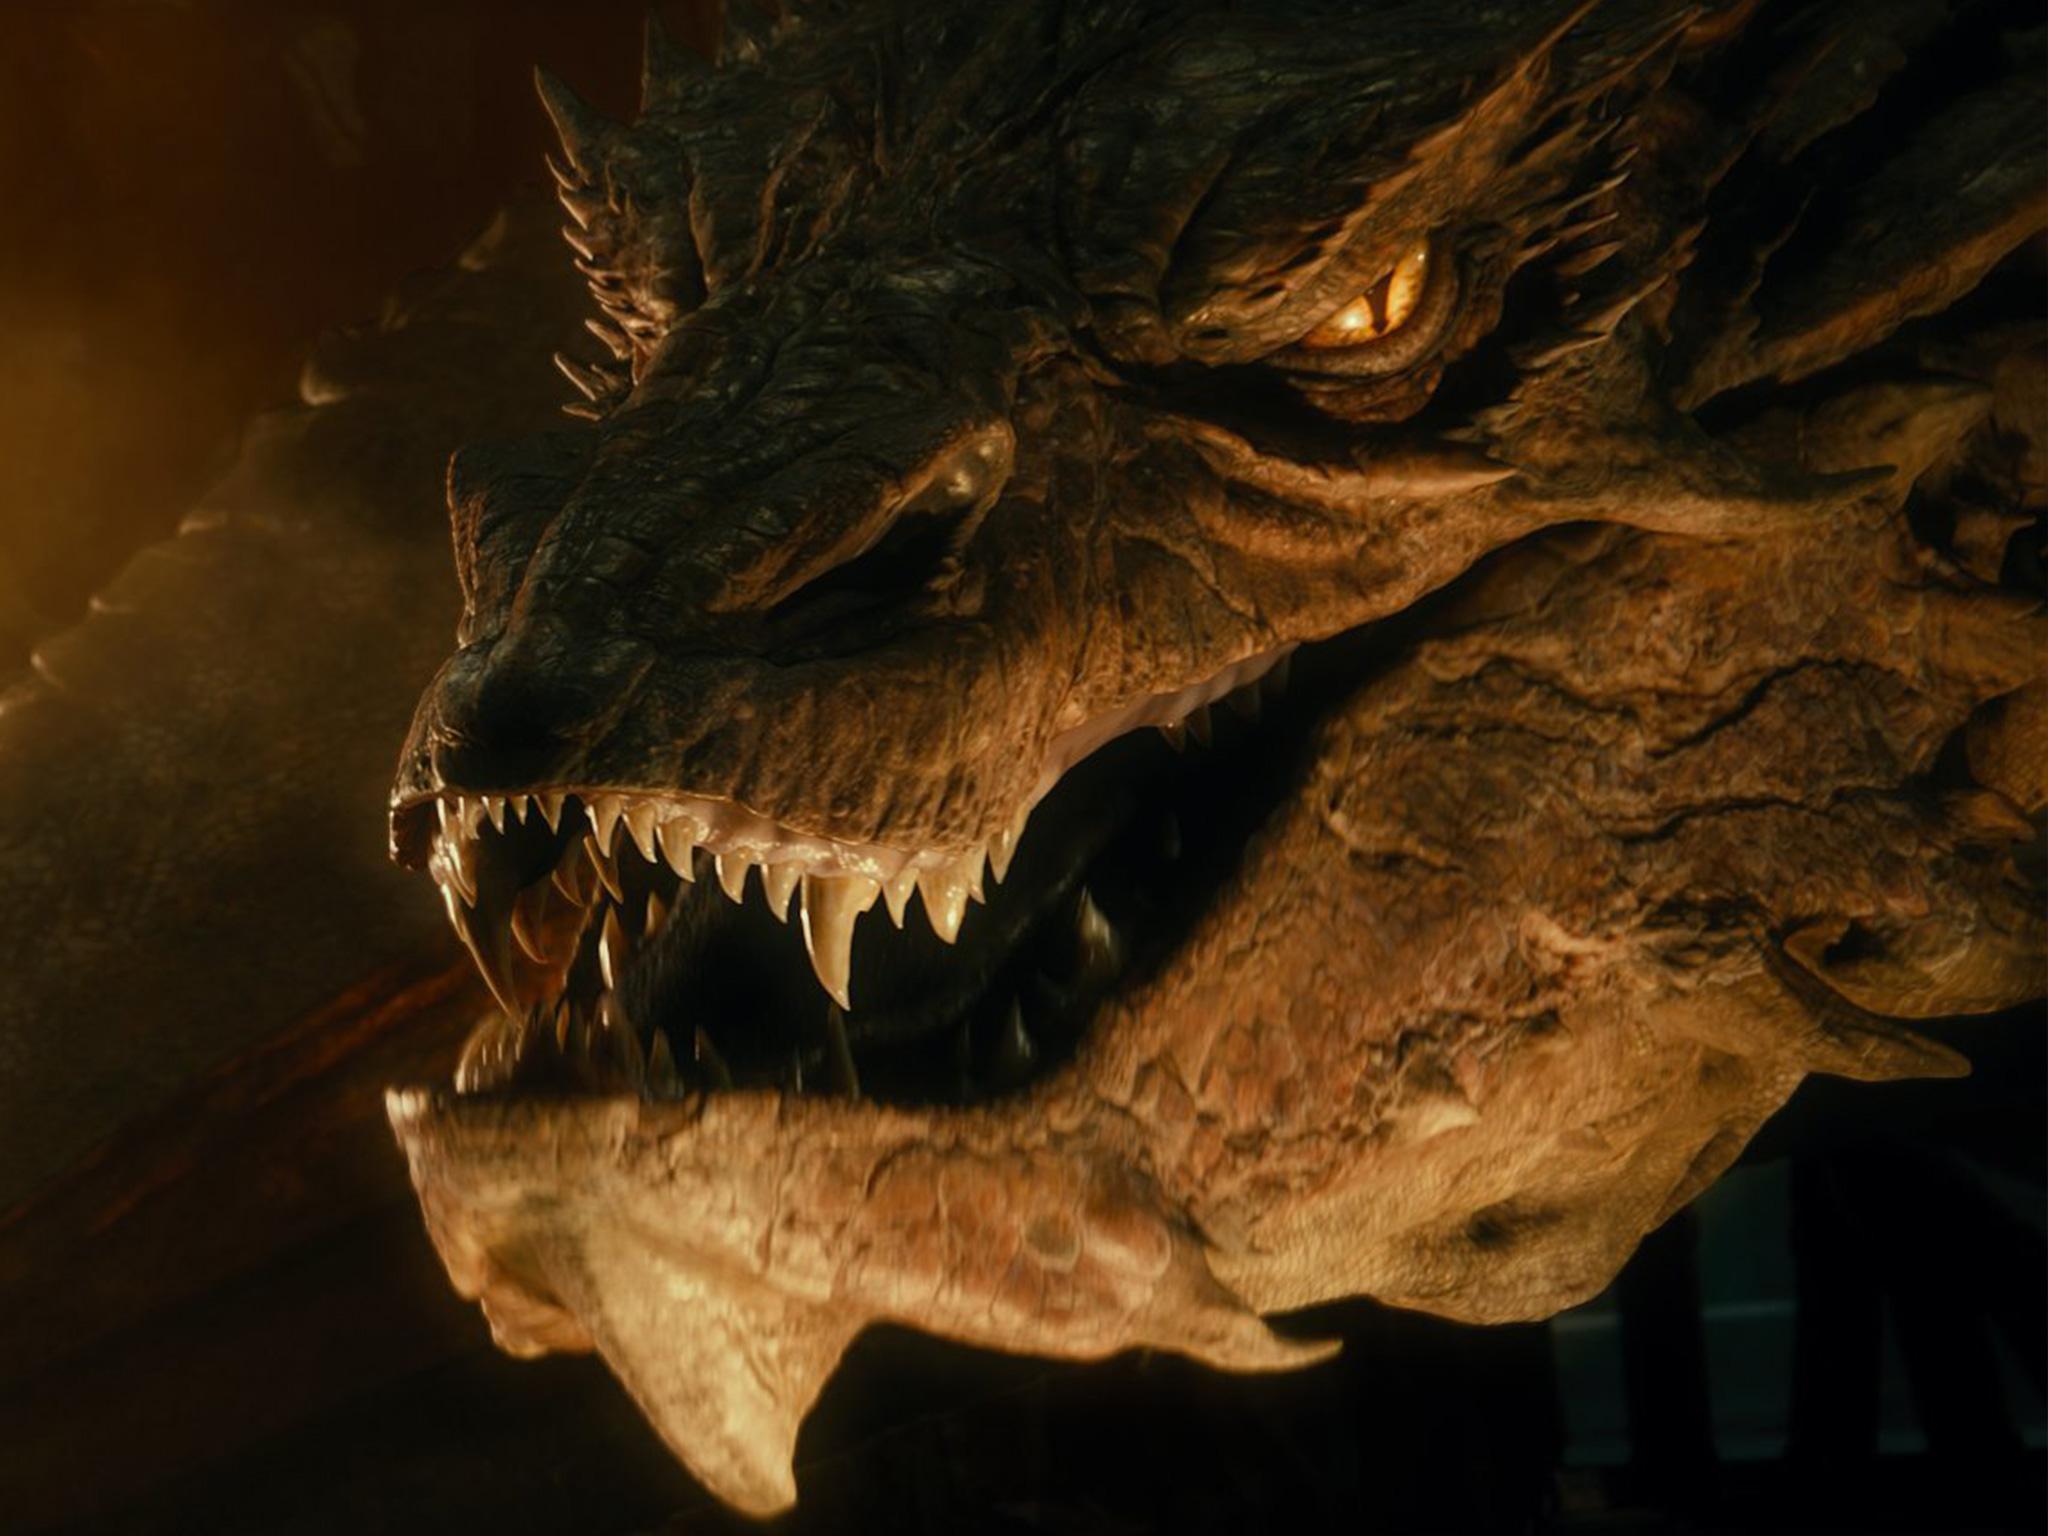 the hobbit: the desolation of smaug | tntdrama